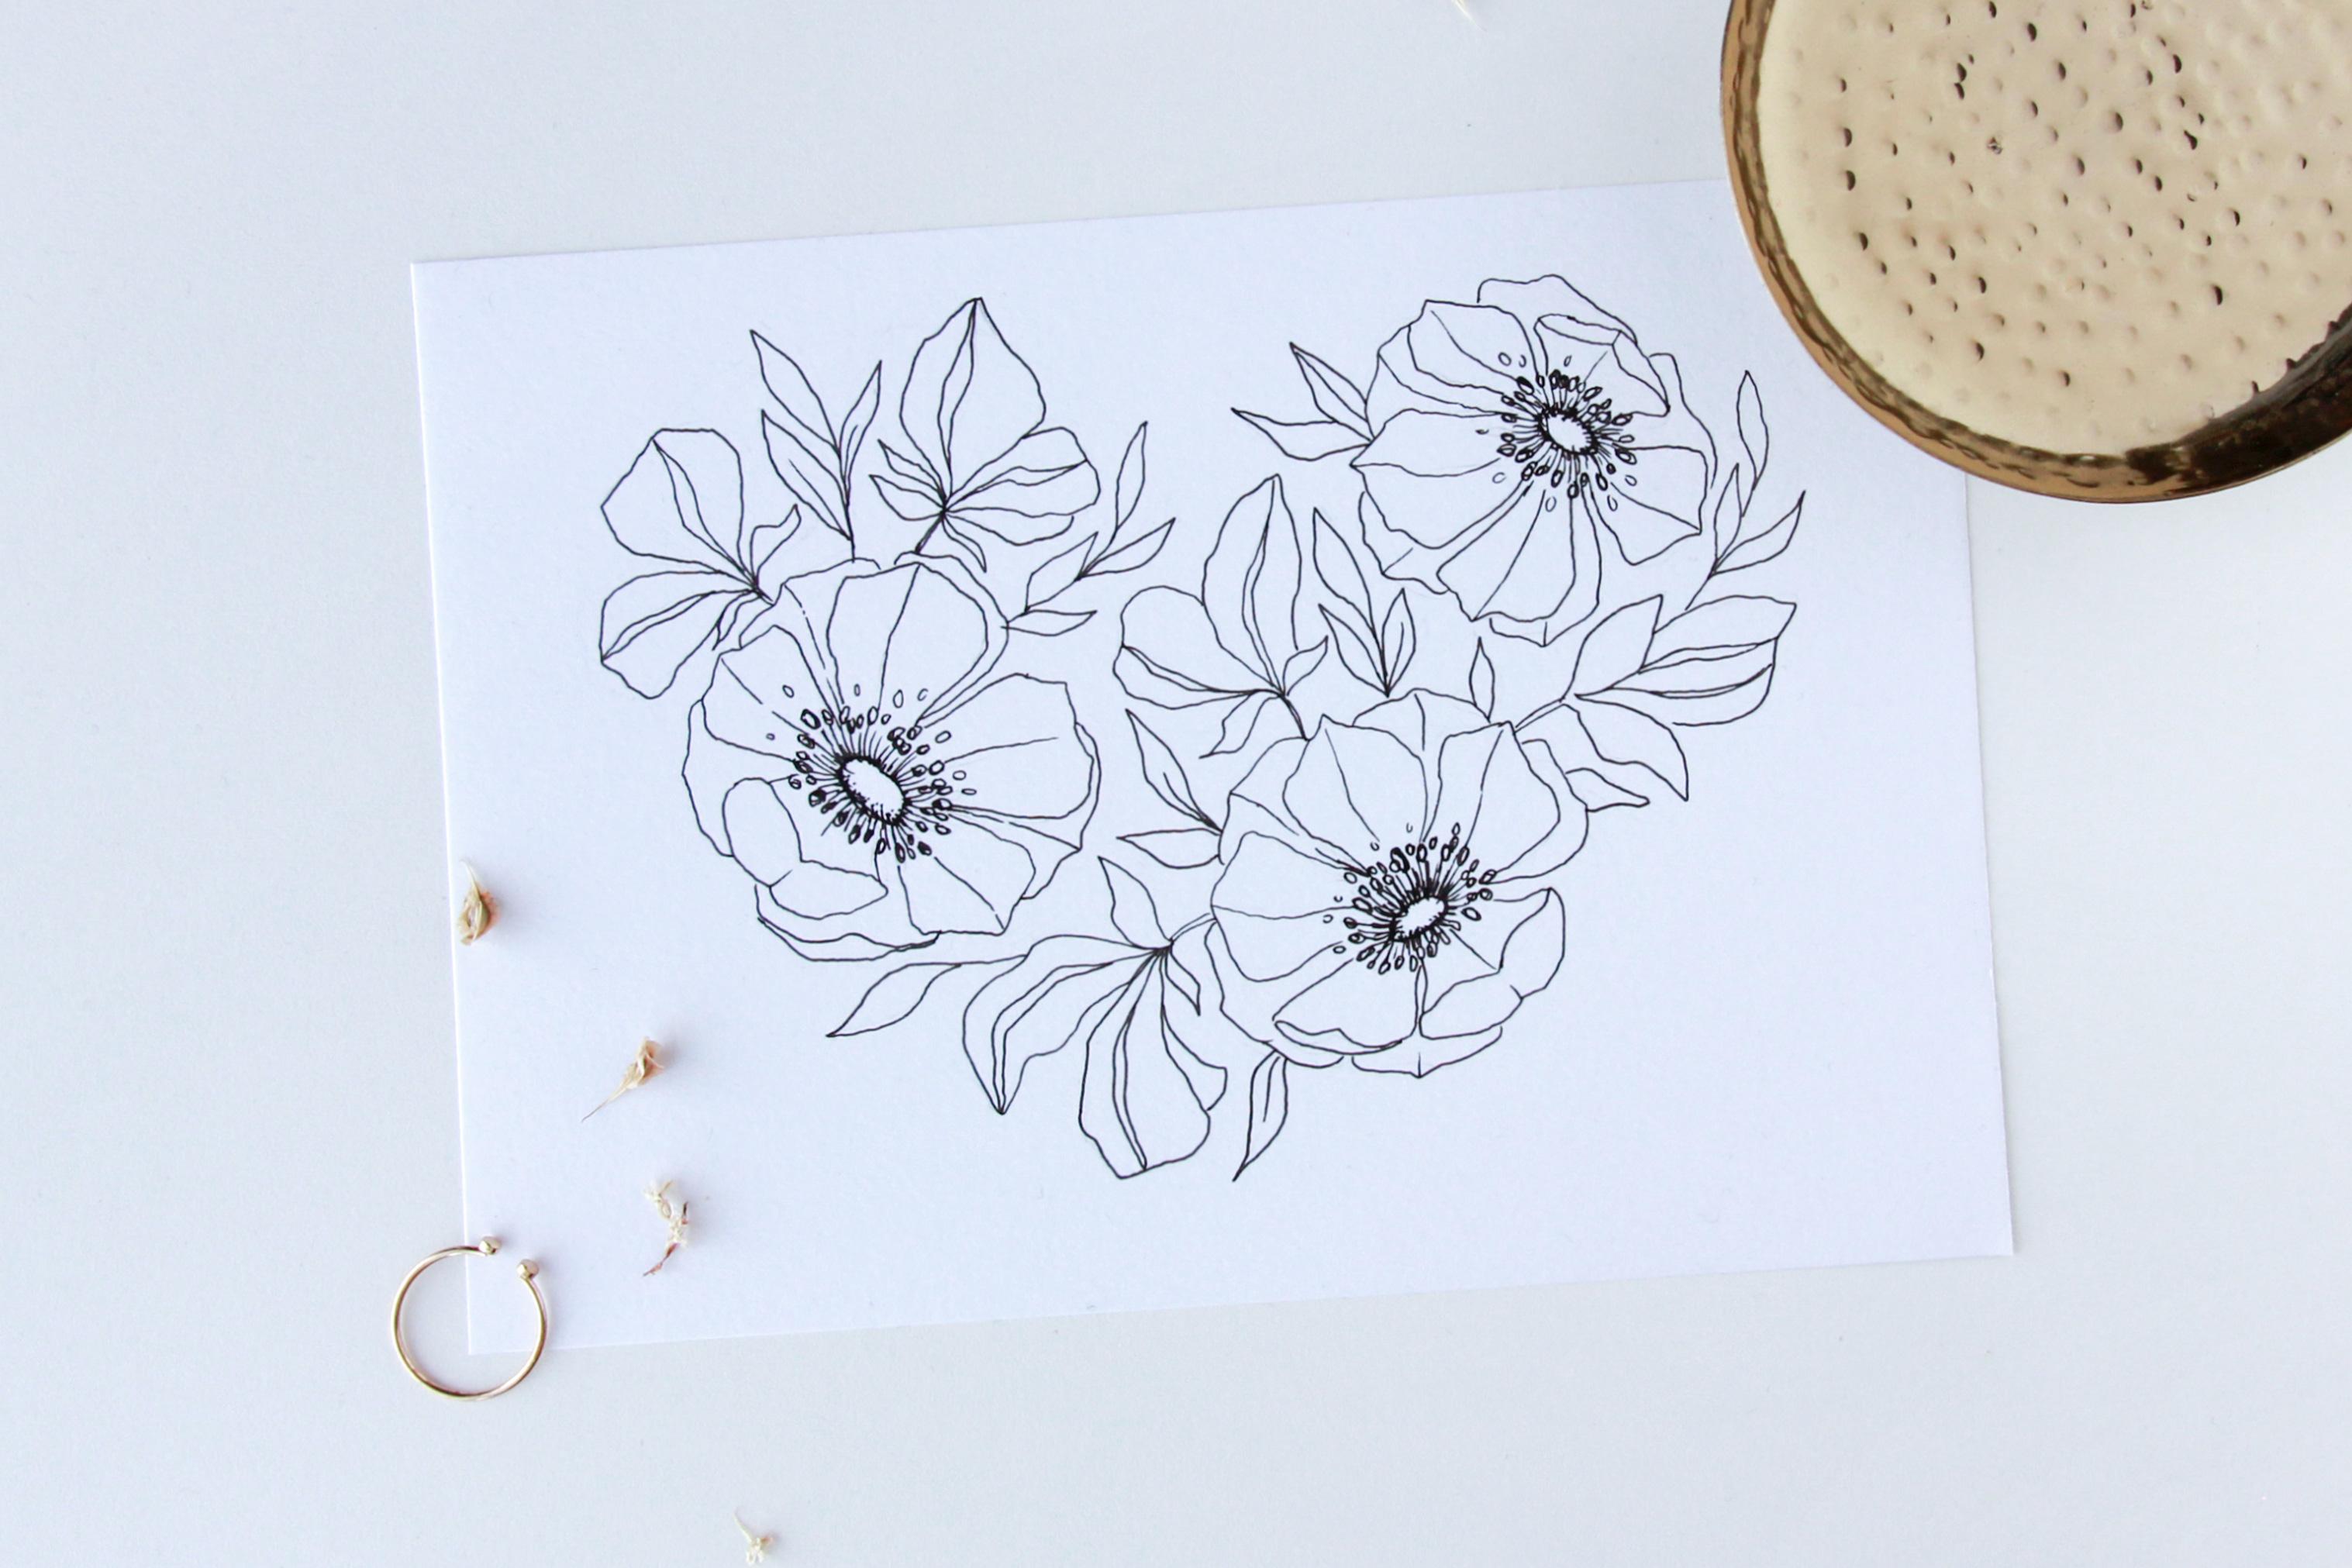 Floral heart illustration - Bloom Creatives art classes